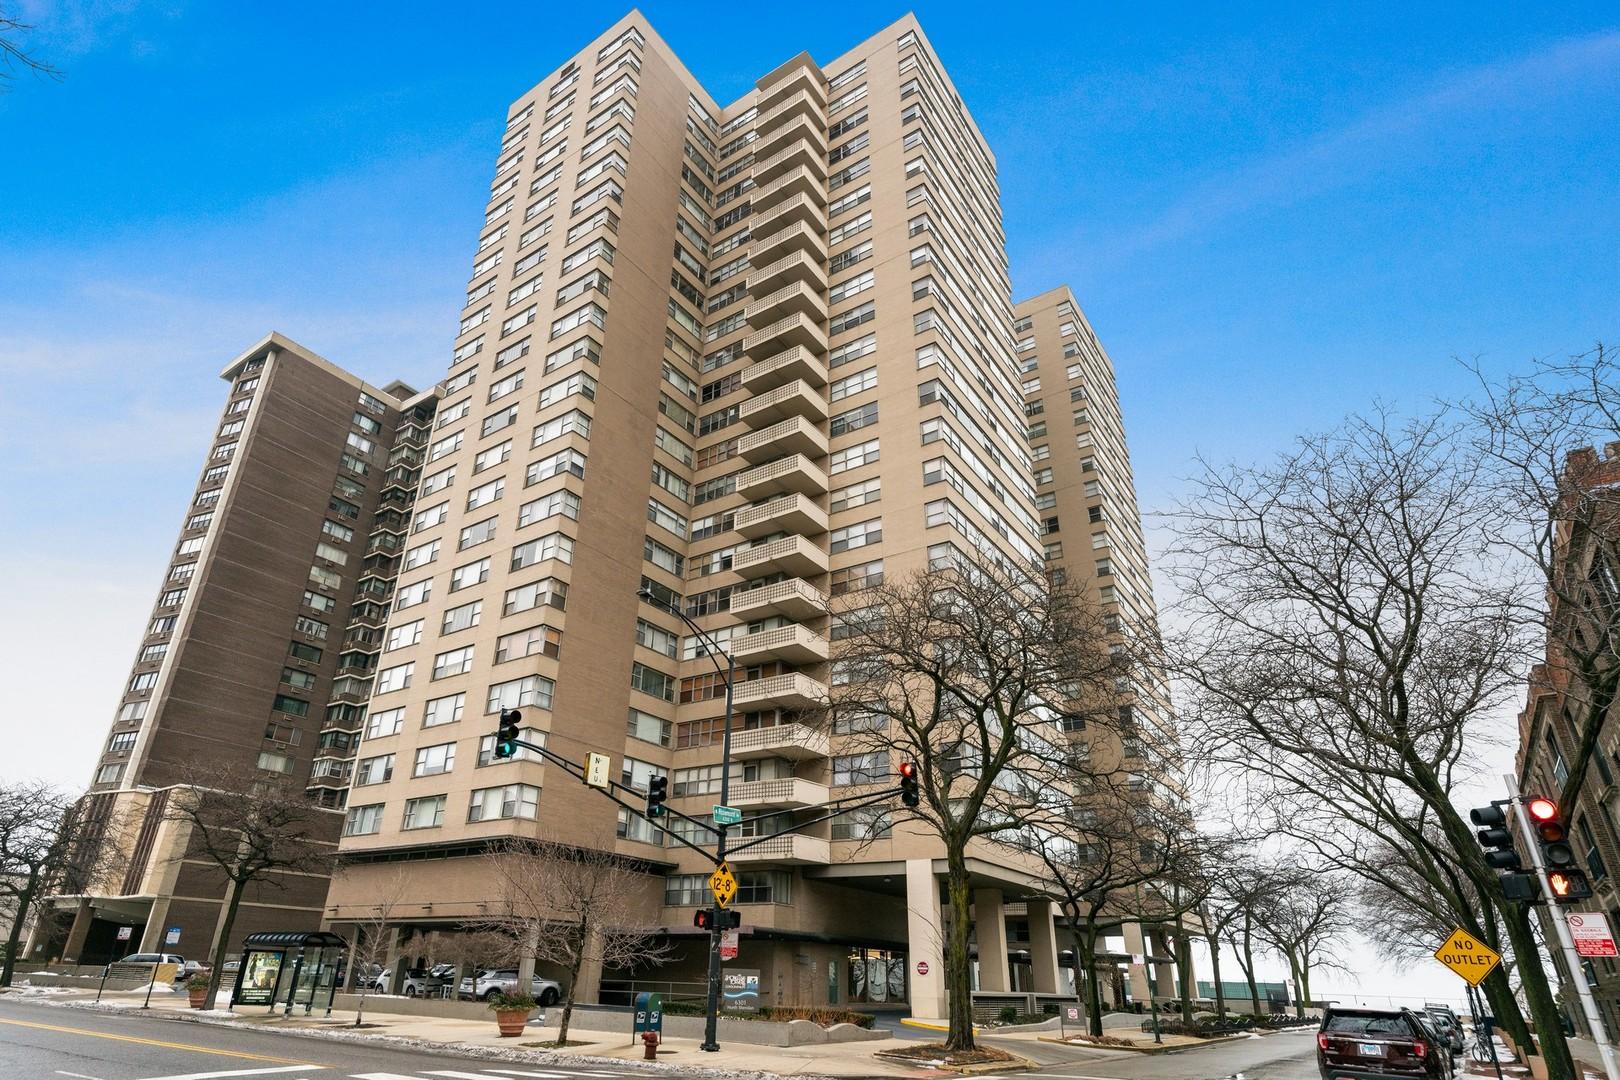 6301 N Sheridan Road Unit 21M, Chicago IL 60660